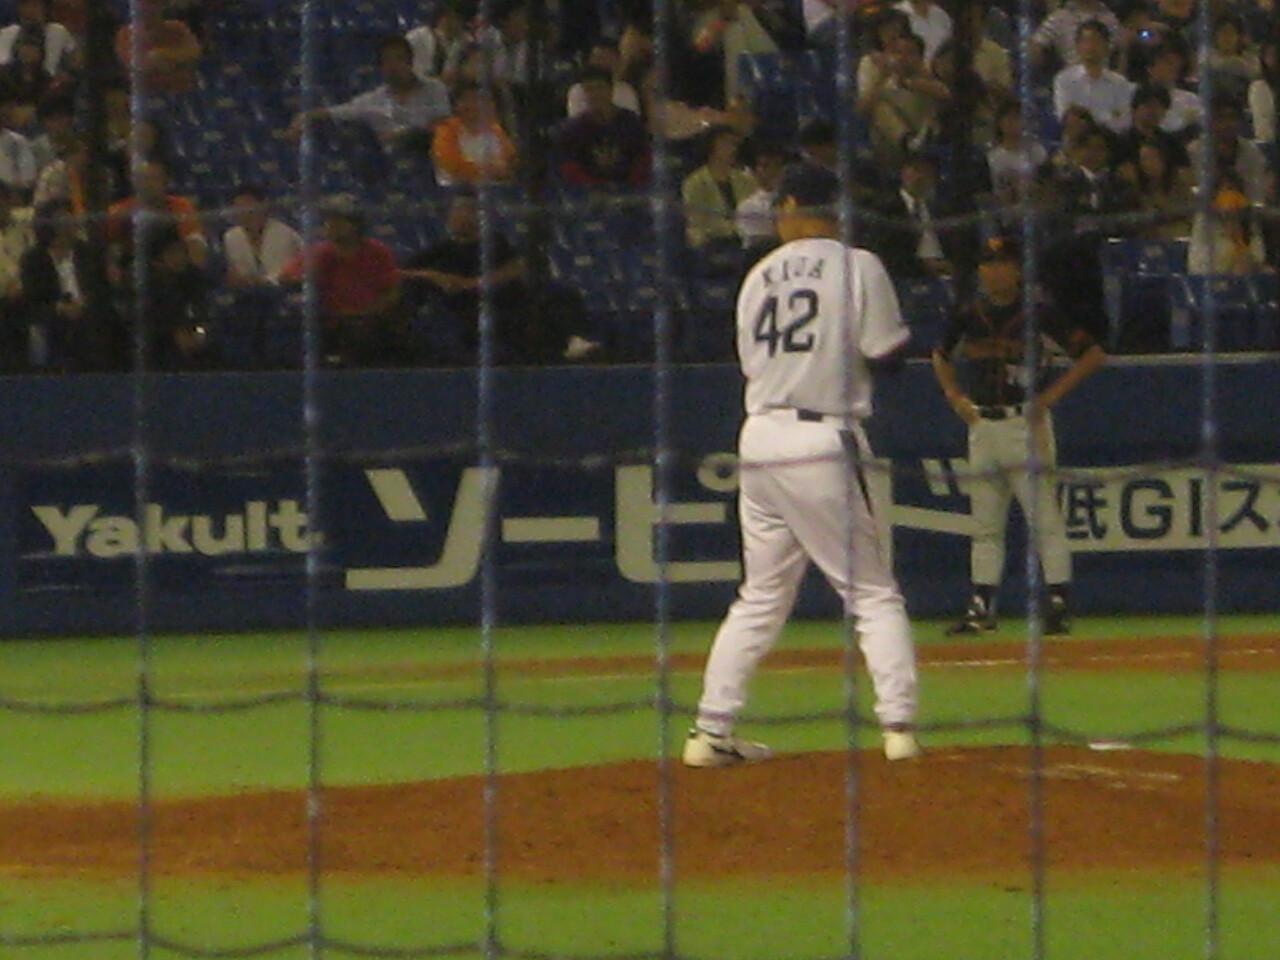 Masao Kida (Yakult Swallows)